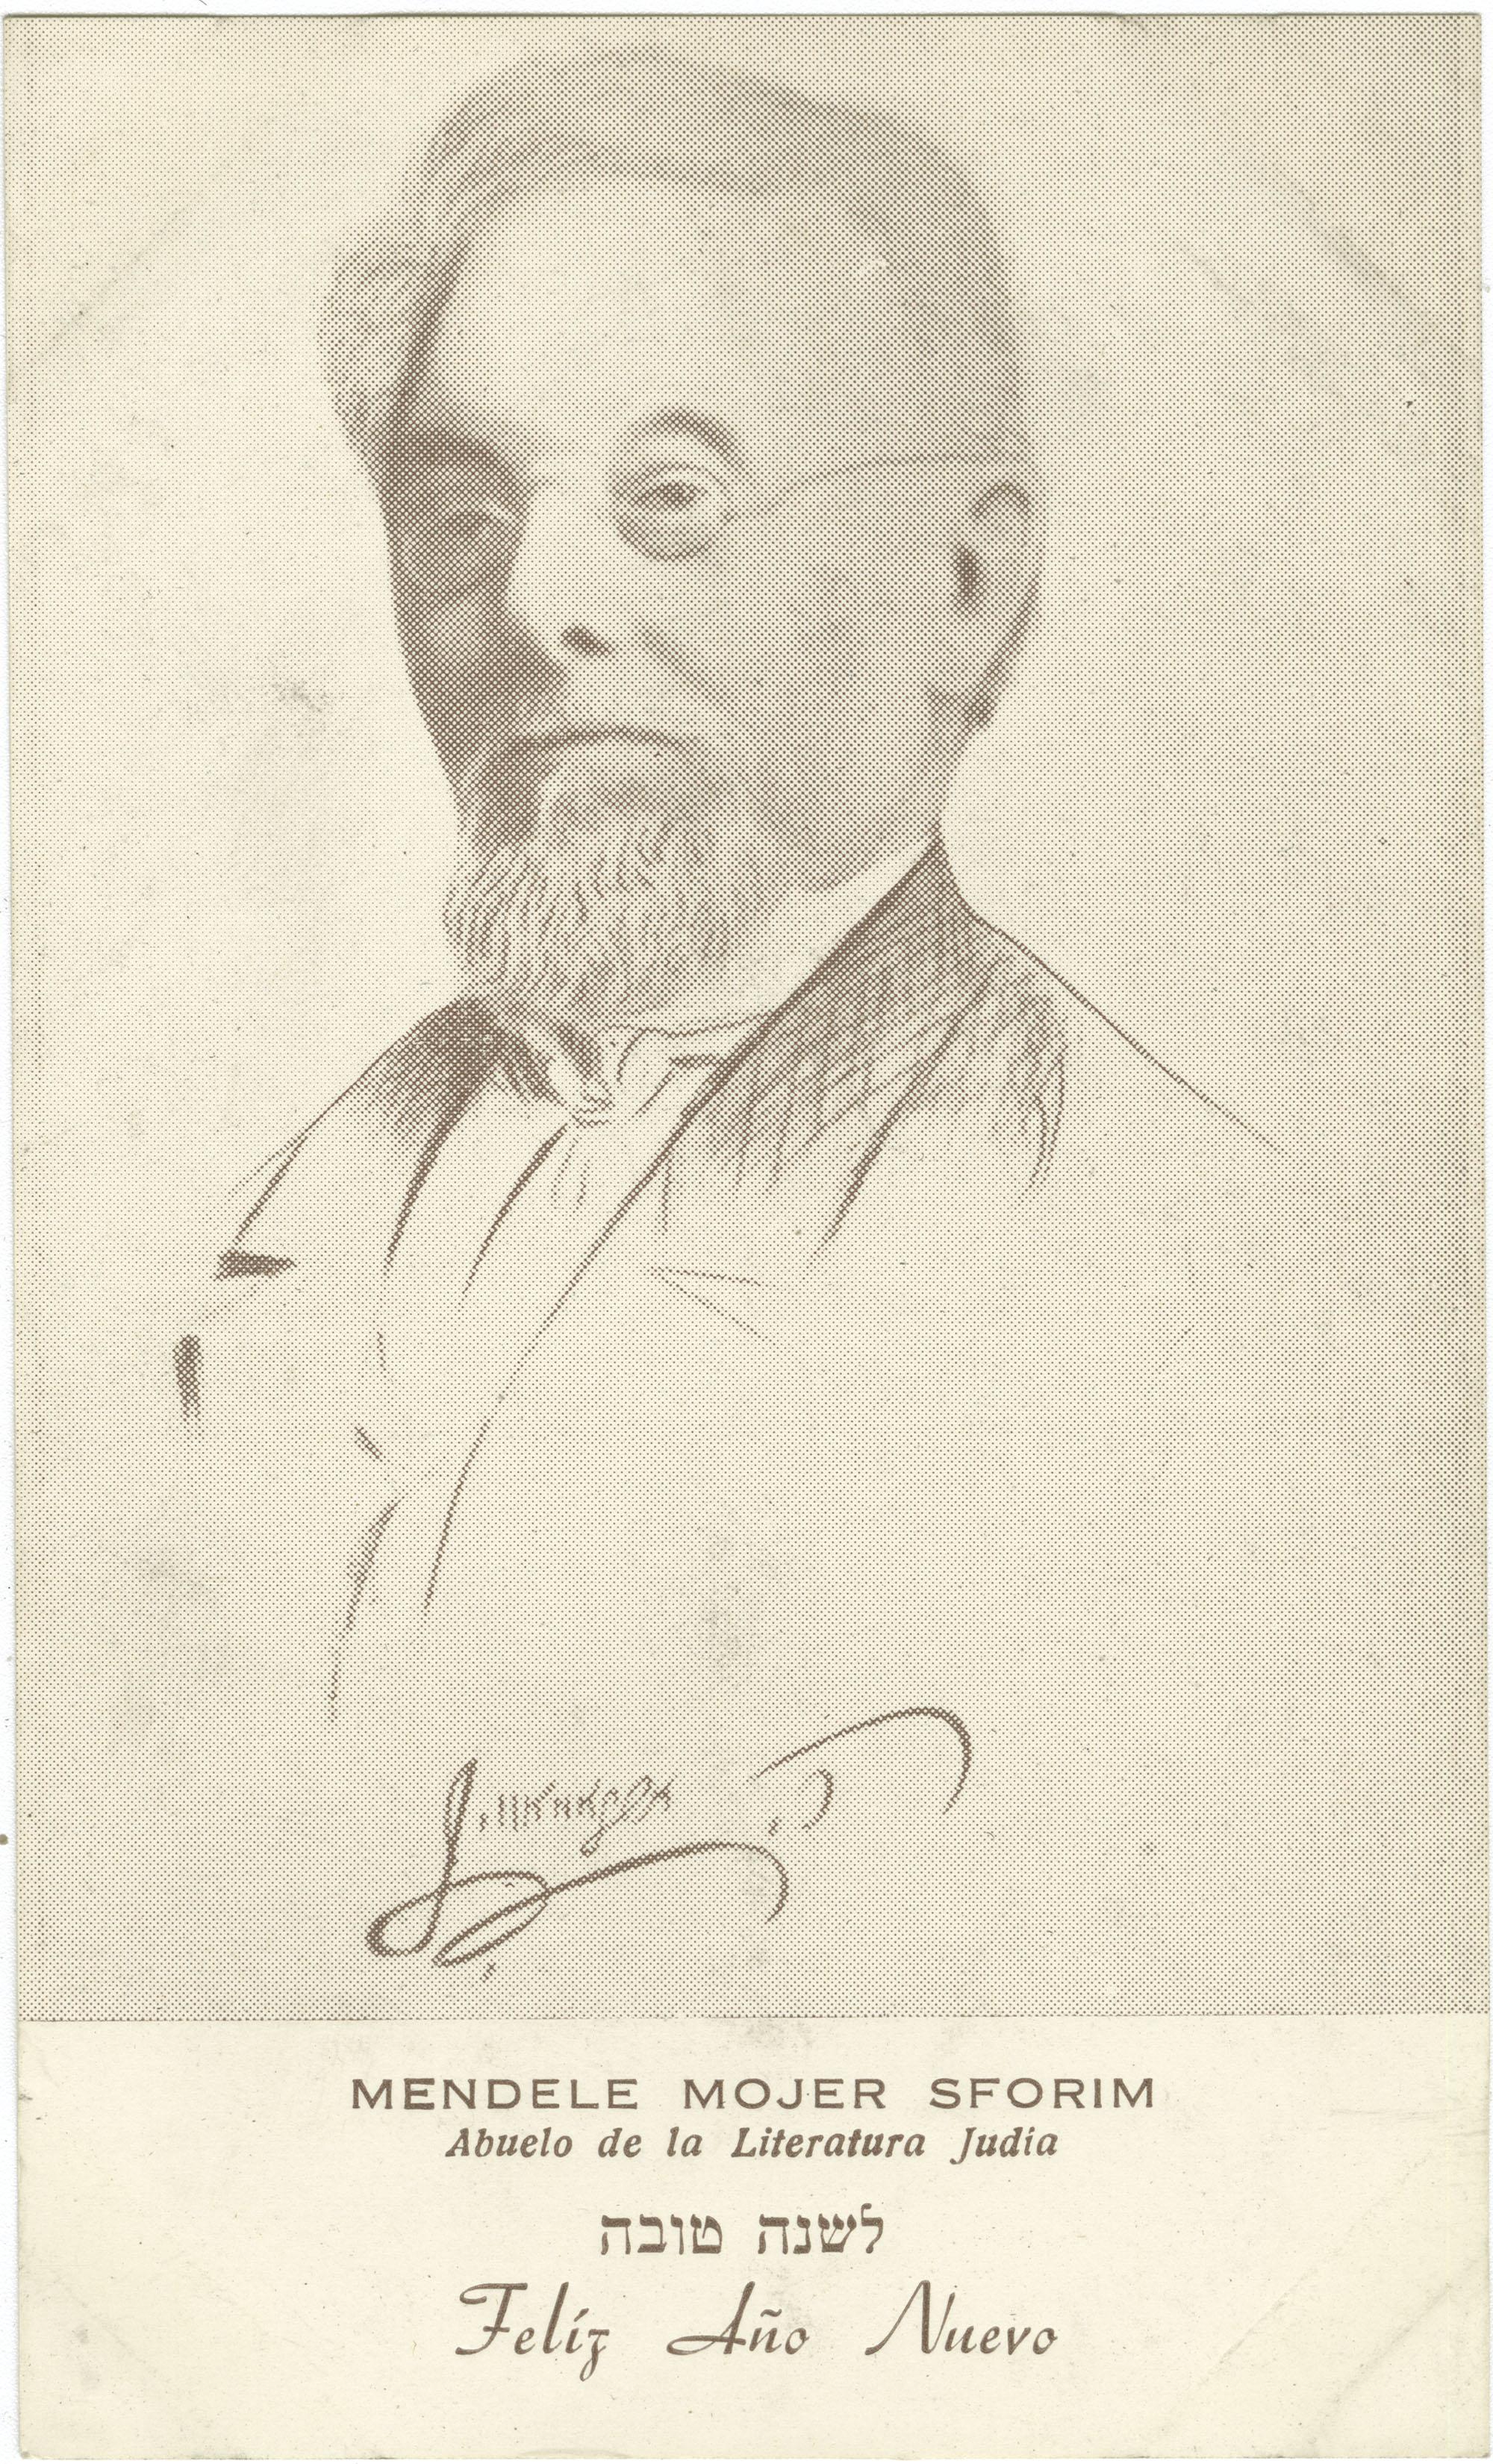 Mendele Mojer Sforim, Abuelo de la Literatura Judía